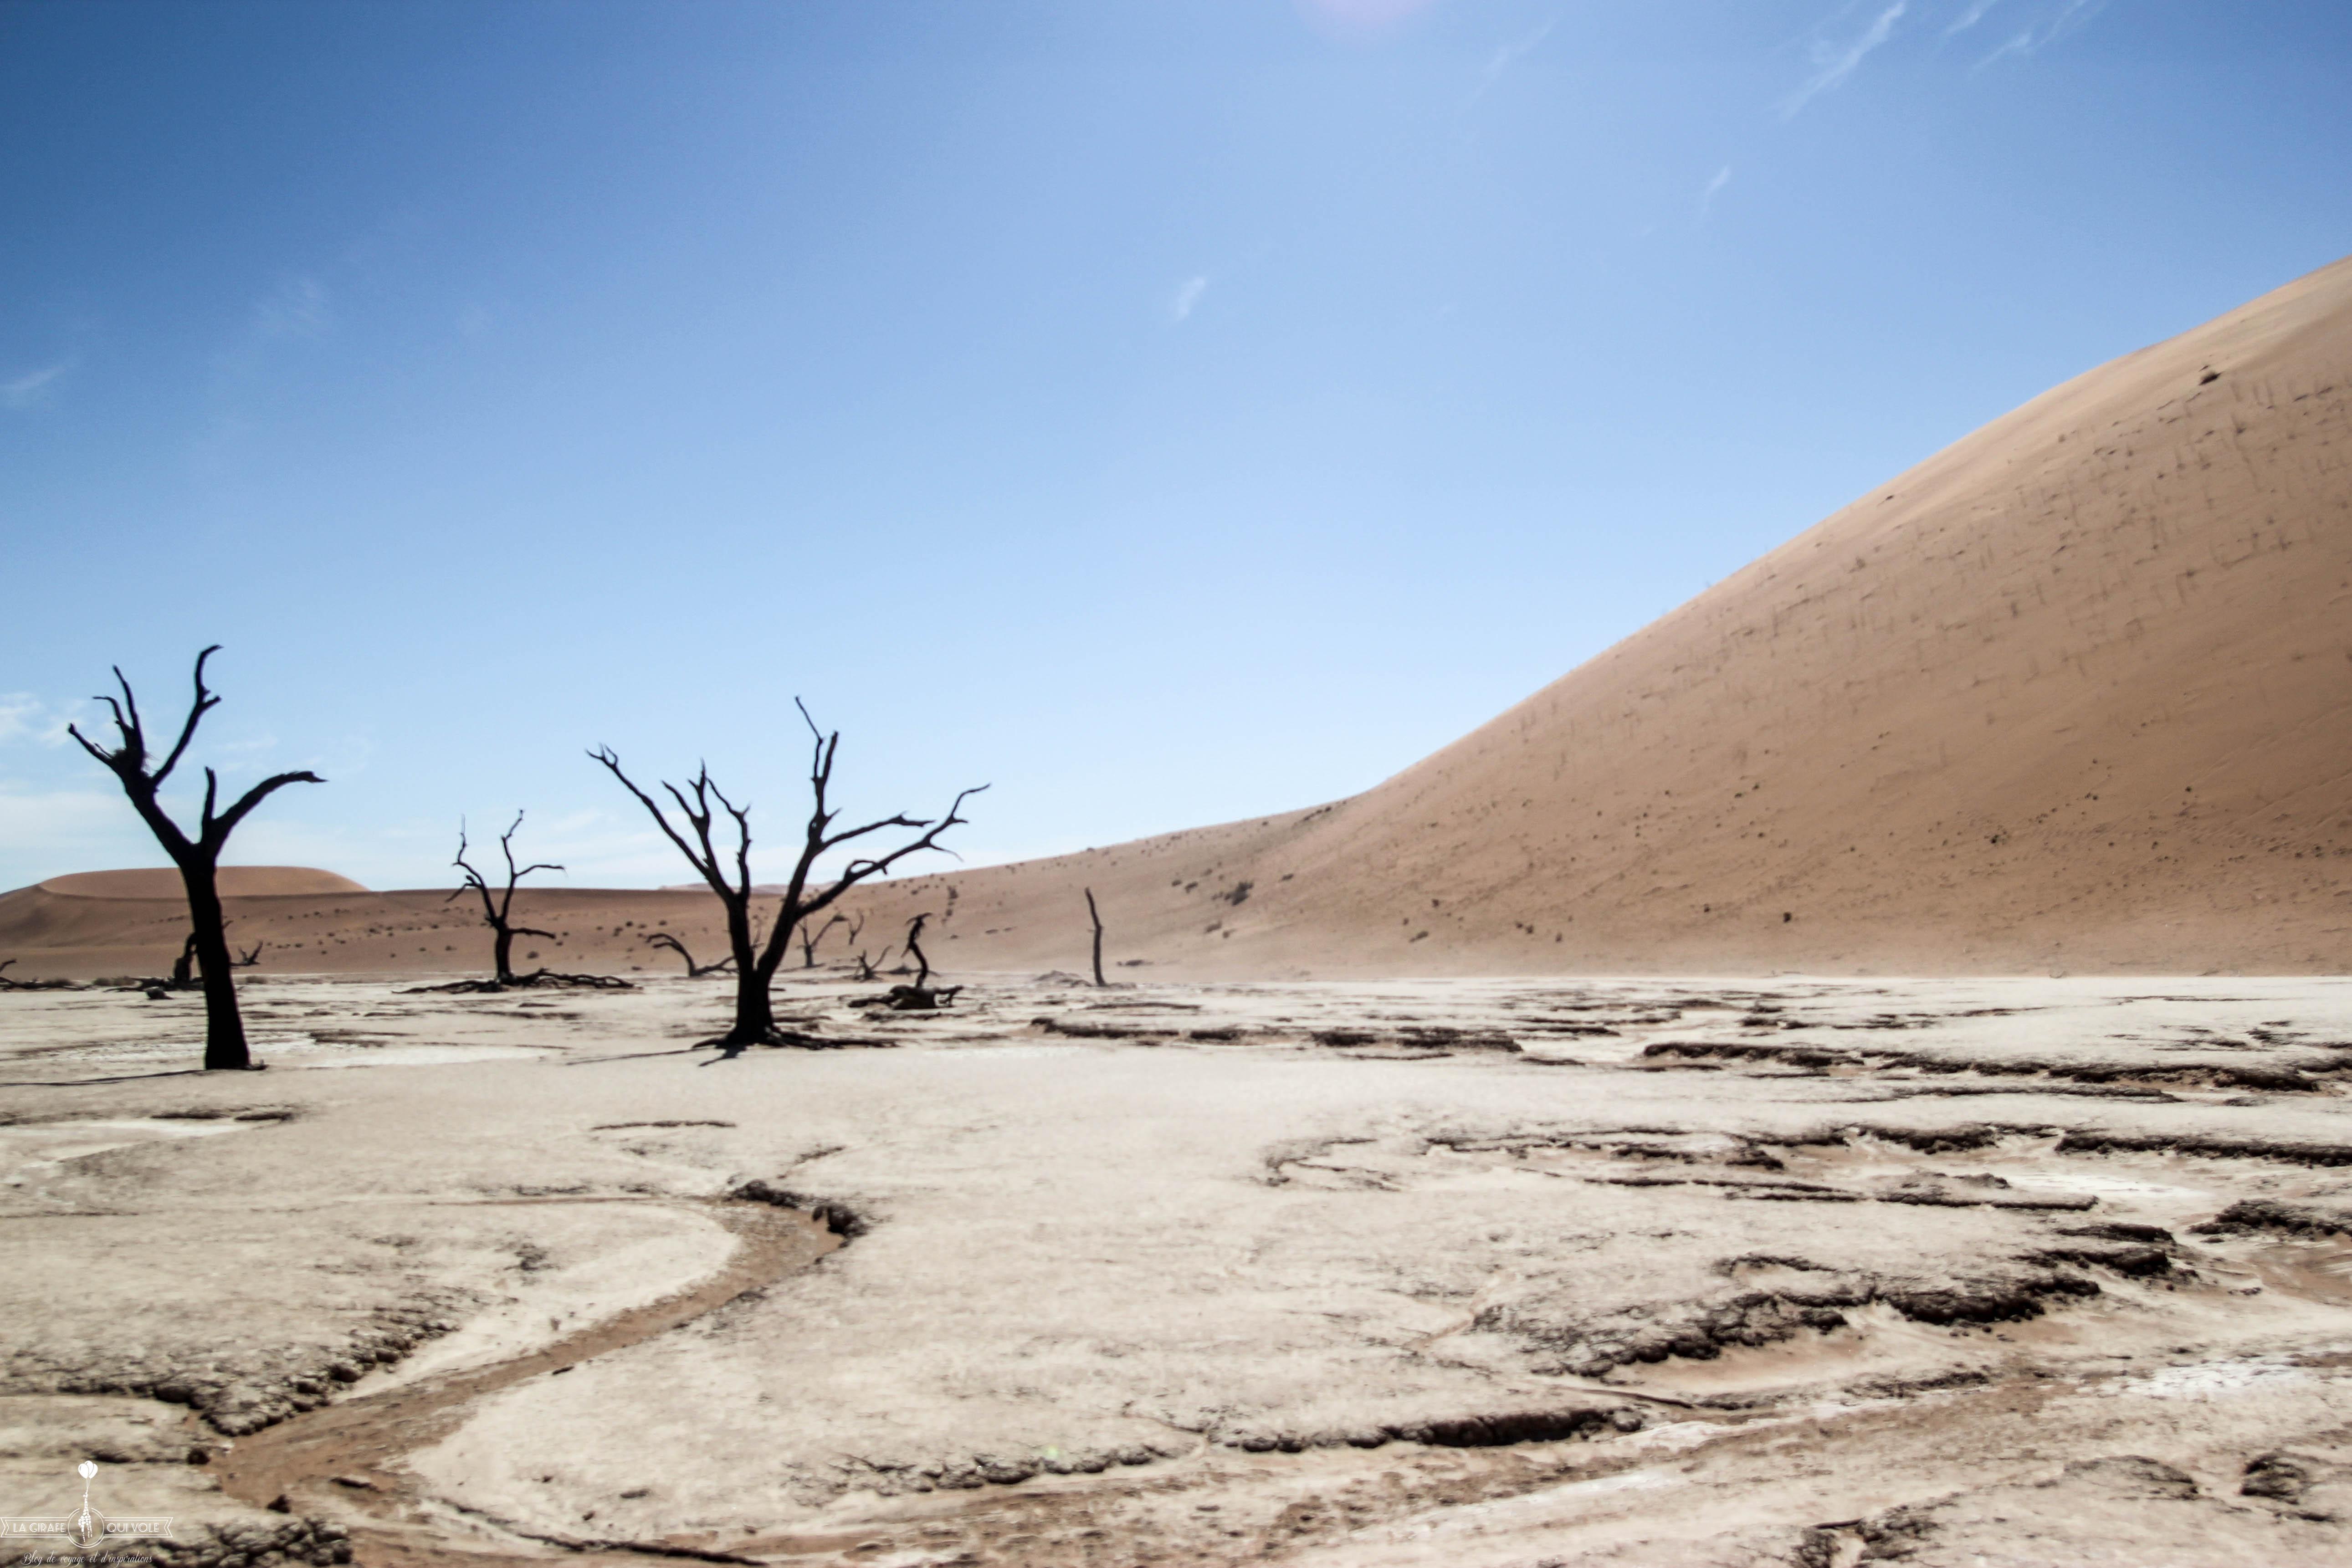 NamibieLe France Préparer Guide PratiqueSkyscanner Voyage En Un 6gY7vbyf